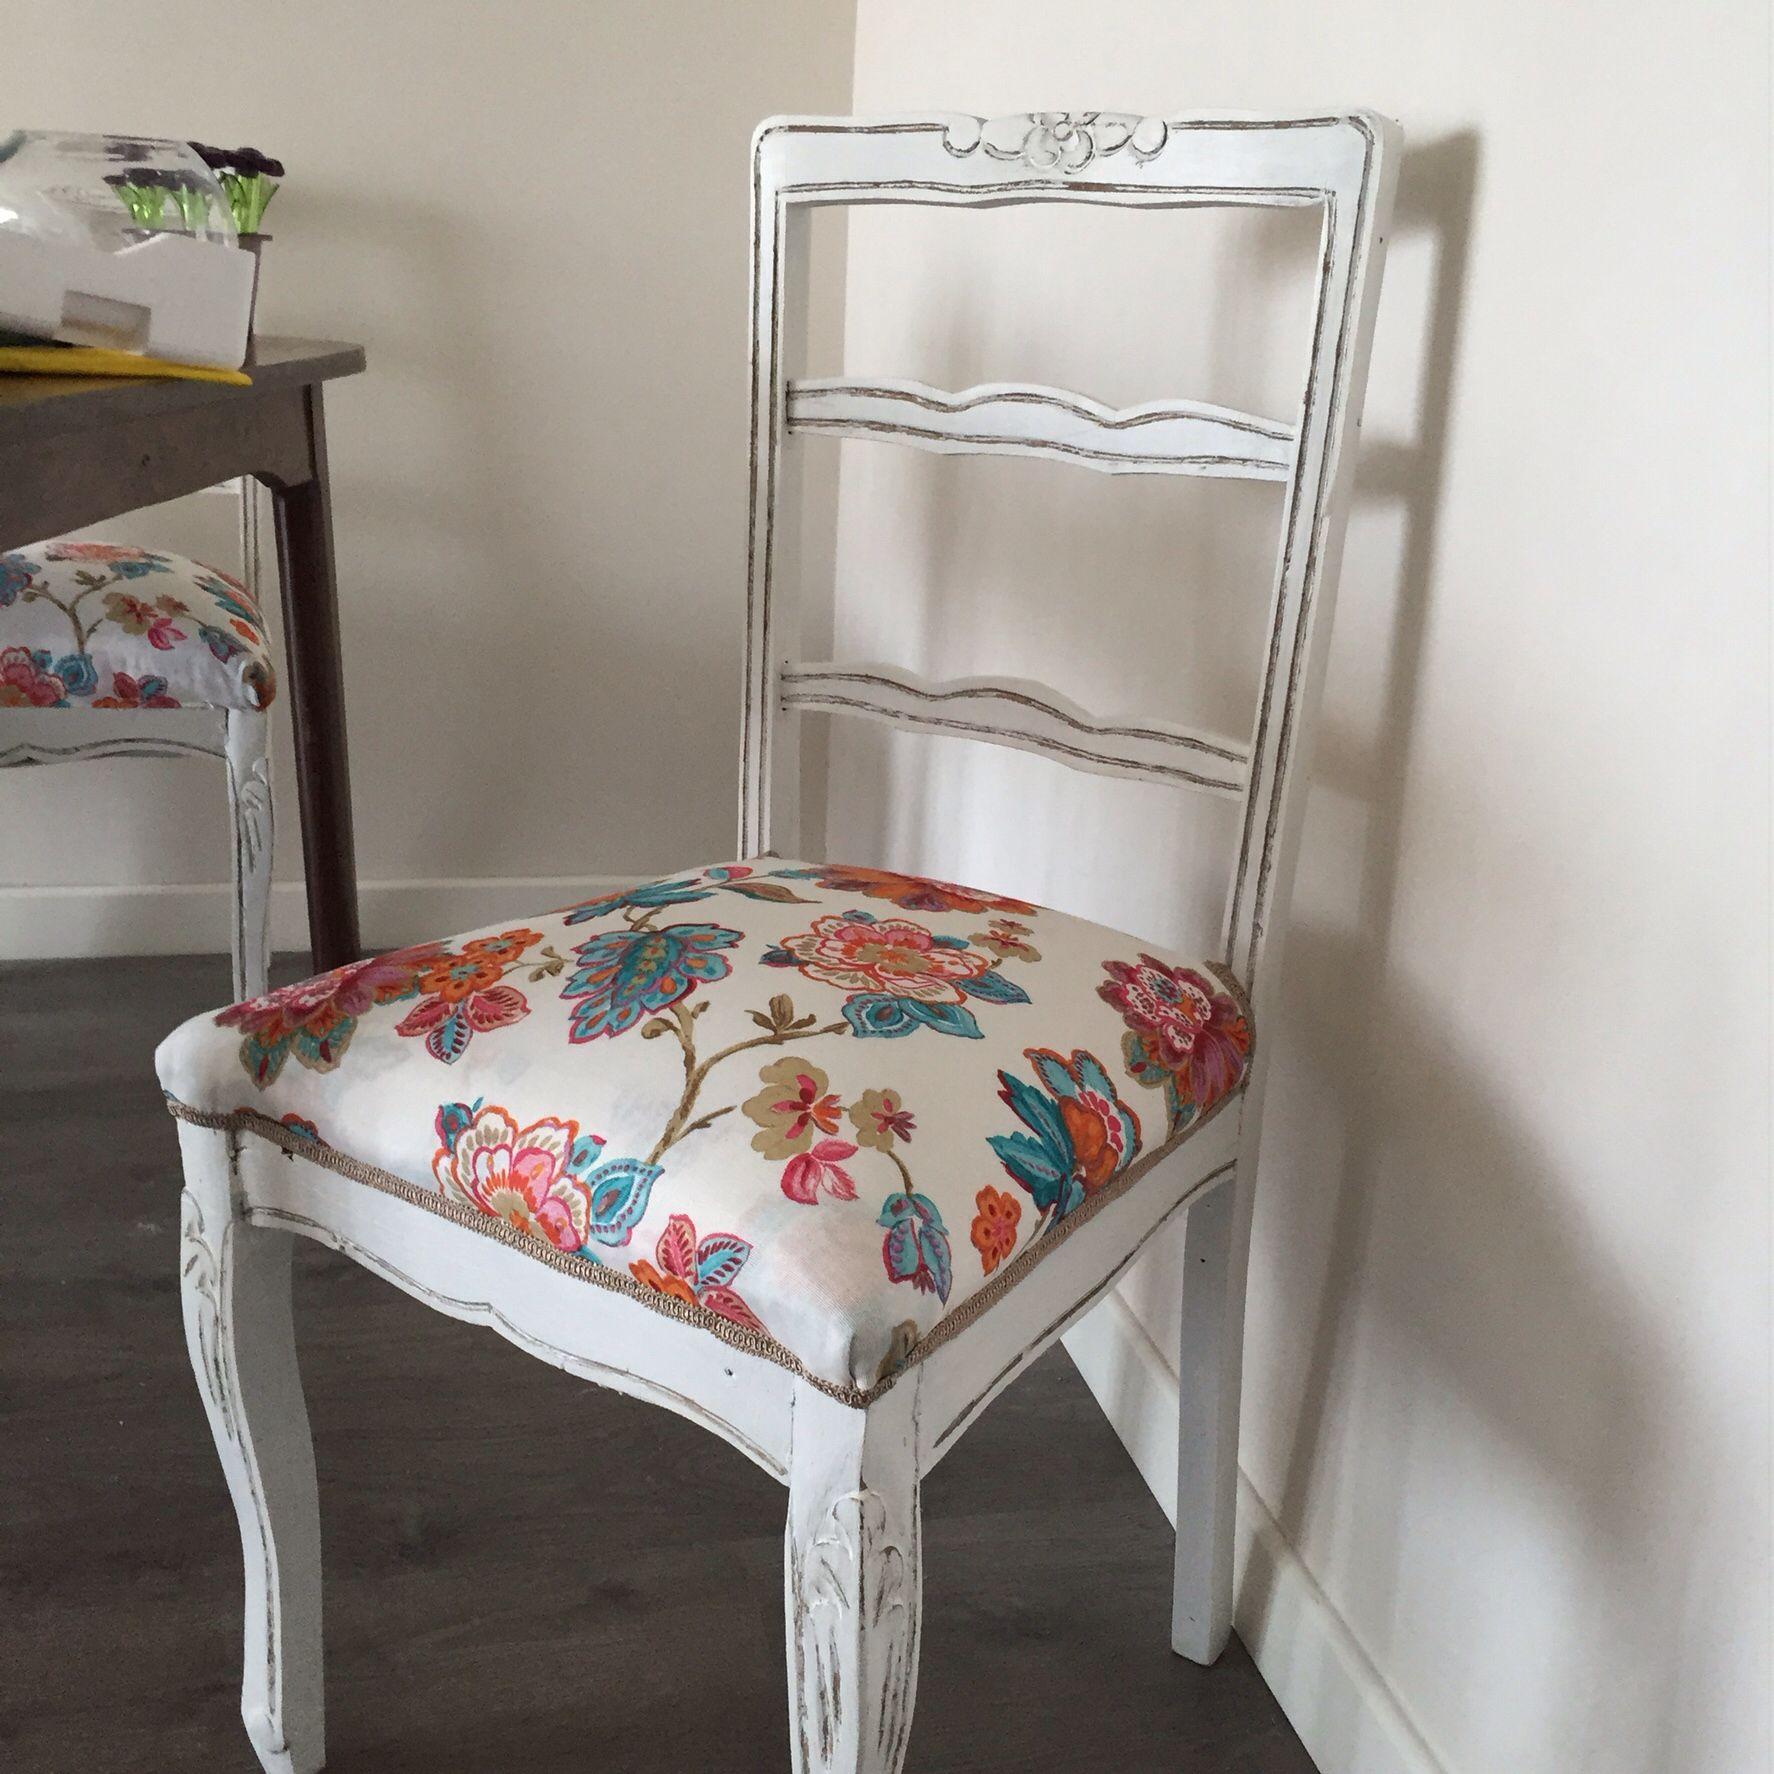 sillas comedor normando deco hogar pinterest sillas On comedor normando